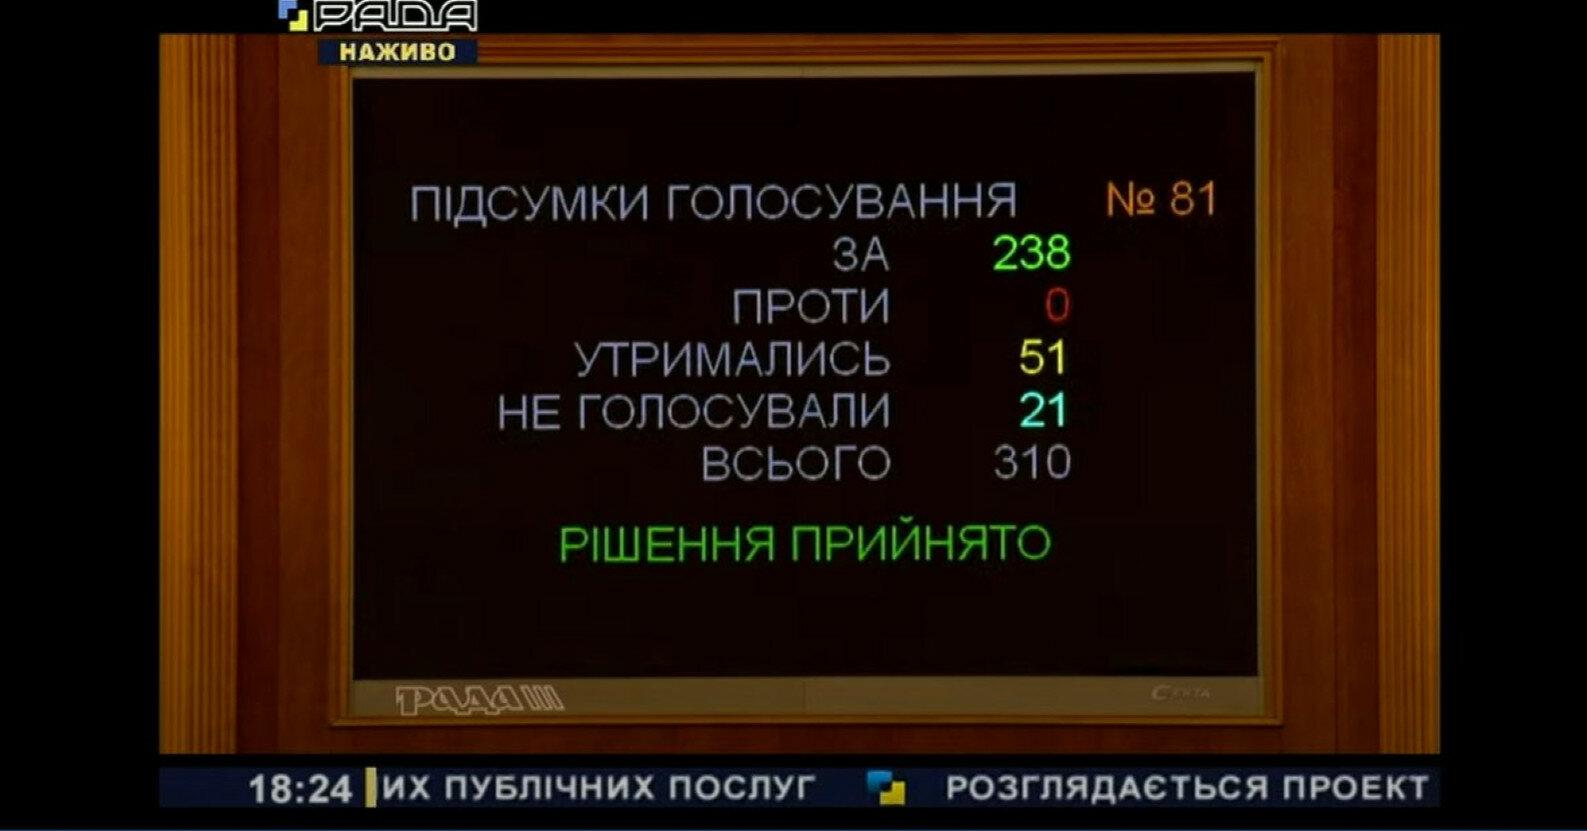 Рaperless в Украине: Рада одобрила законопроект во втором чтении